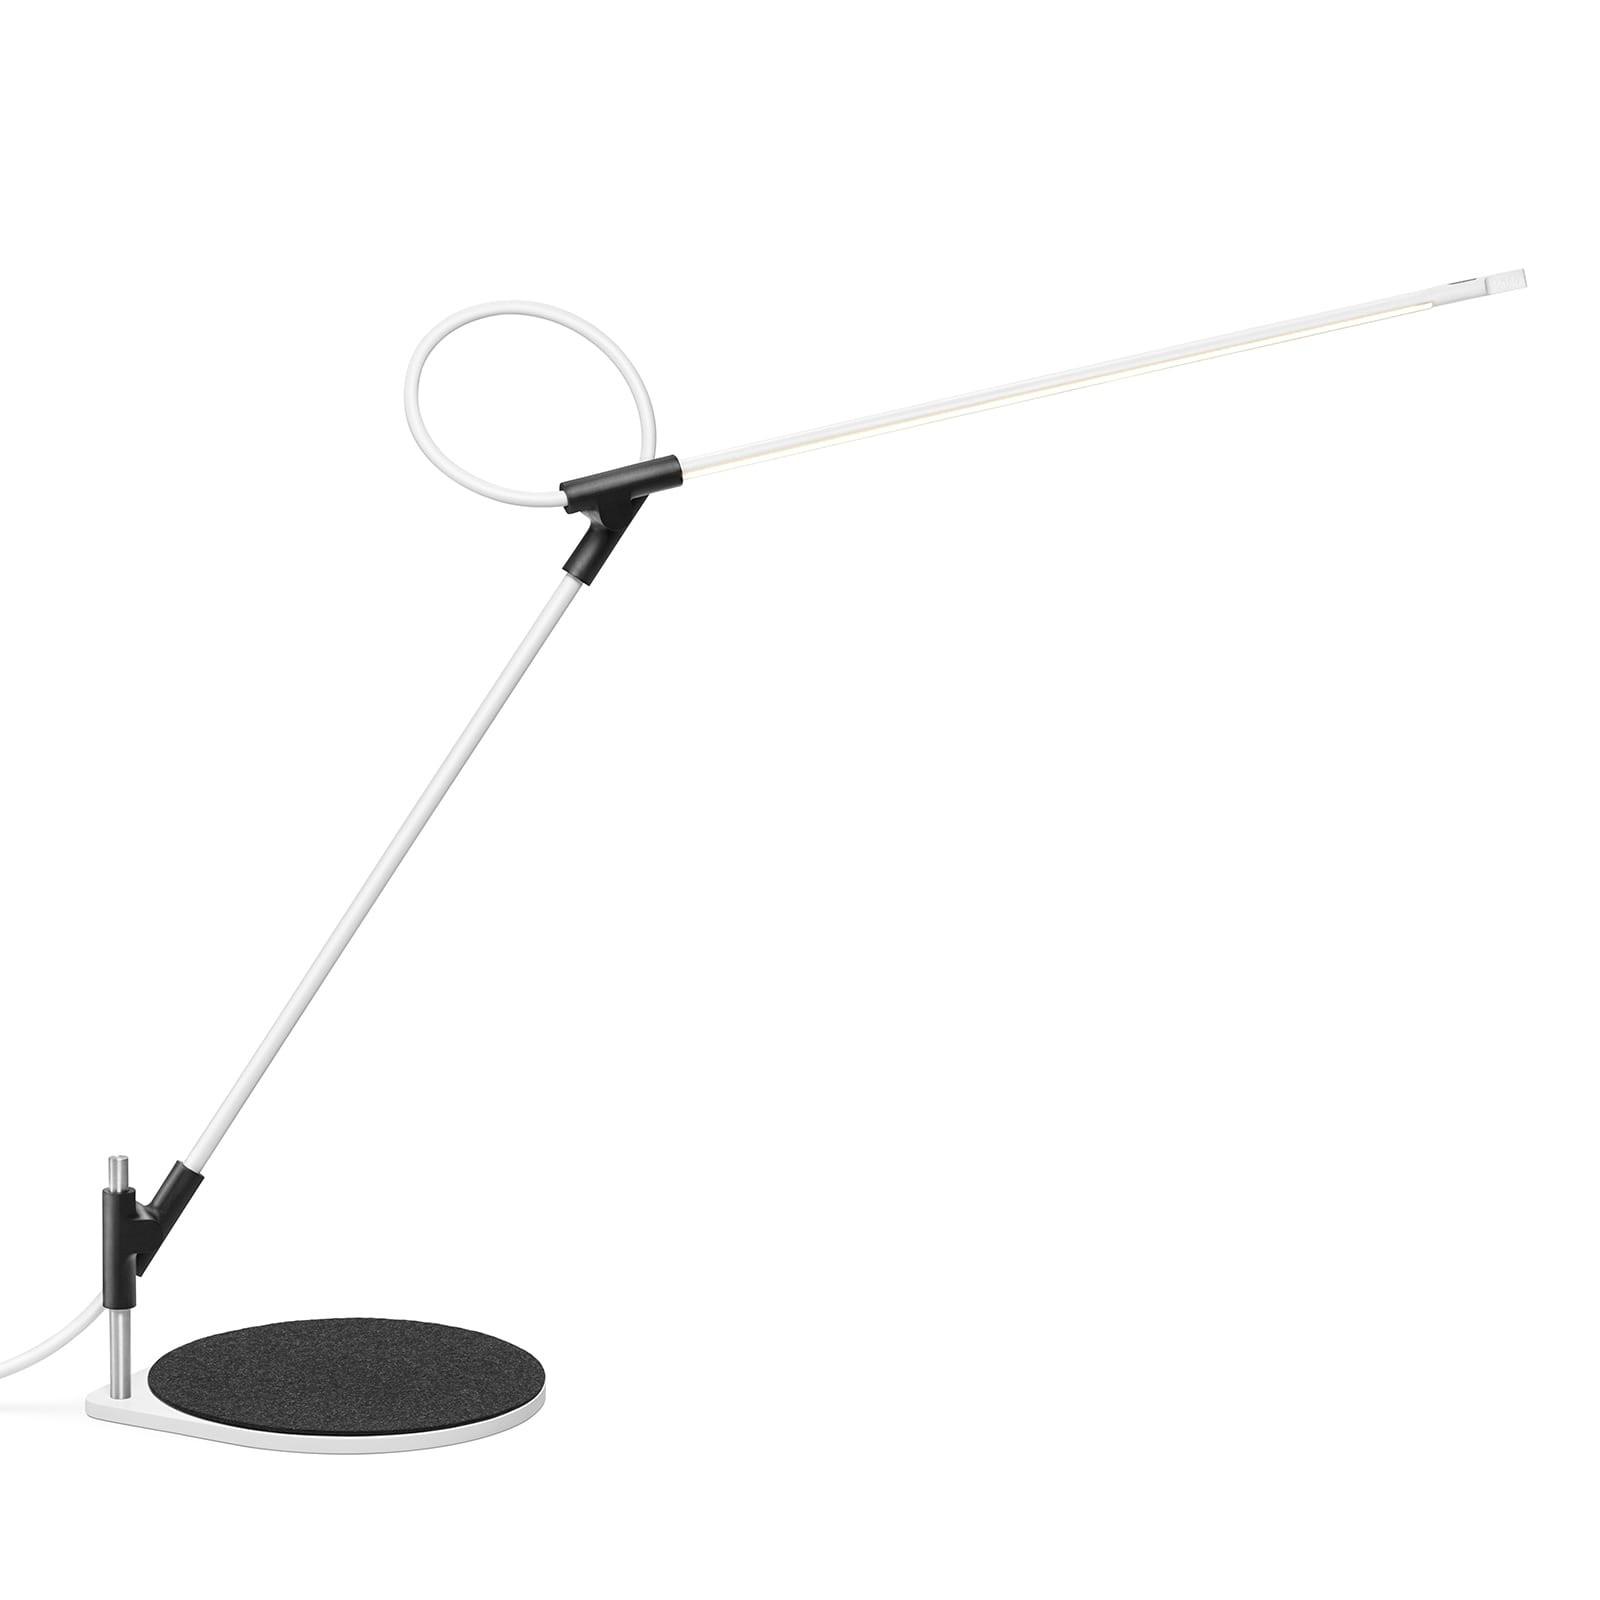 Superlight Φωτιστικό Γραφείου LED (Λευκό) - Pablo Designs